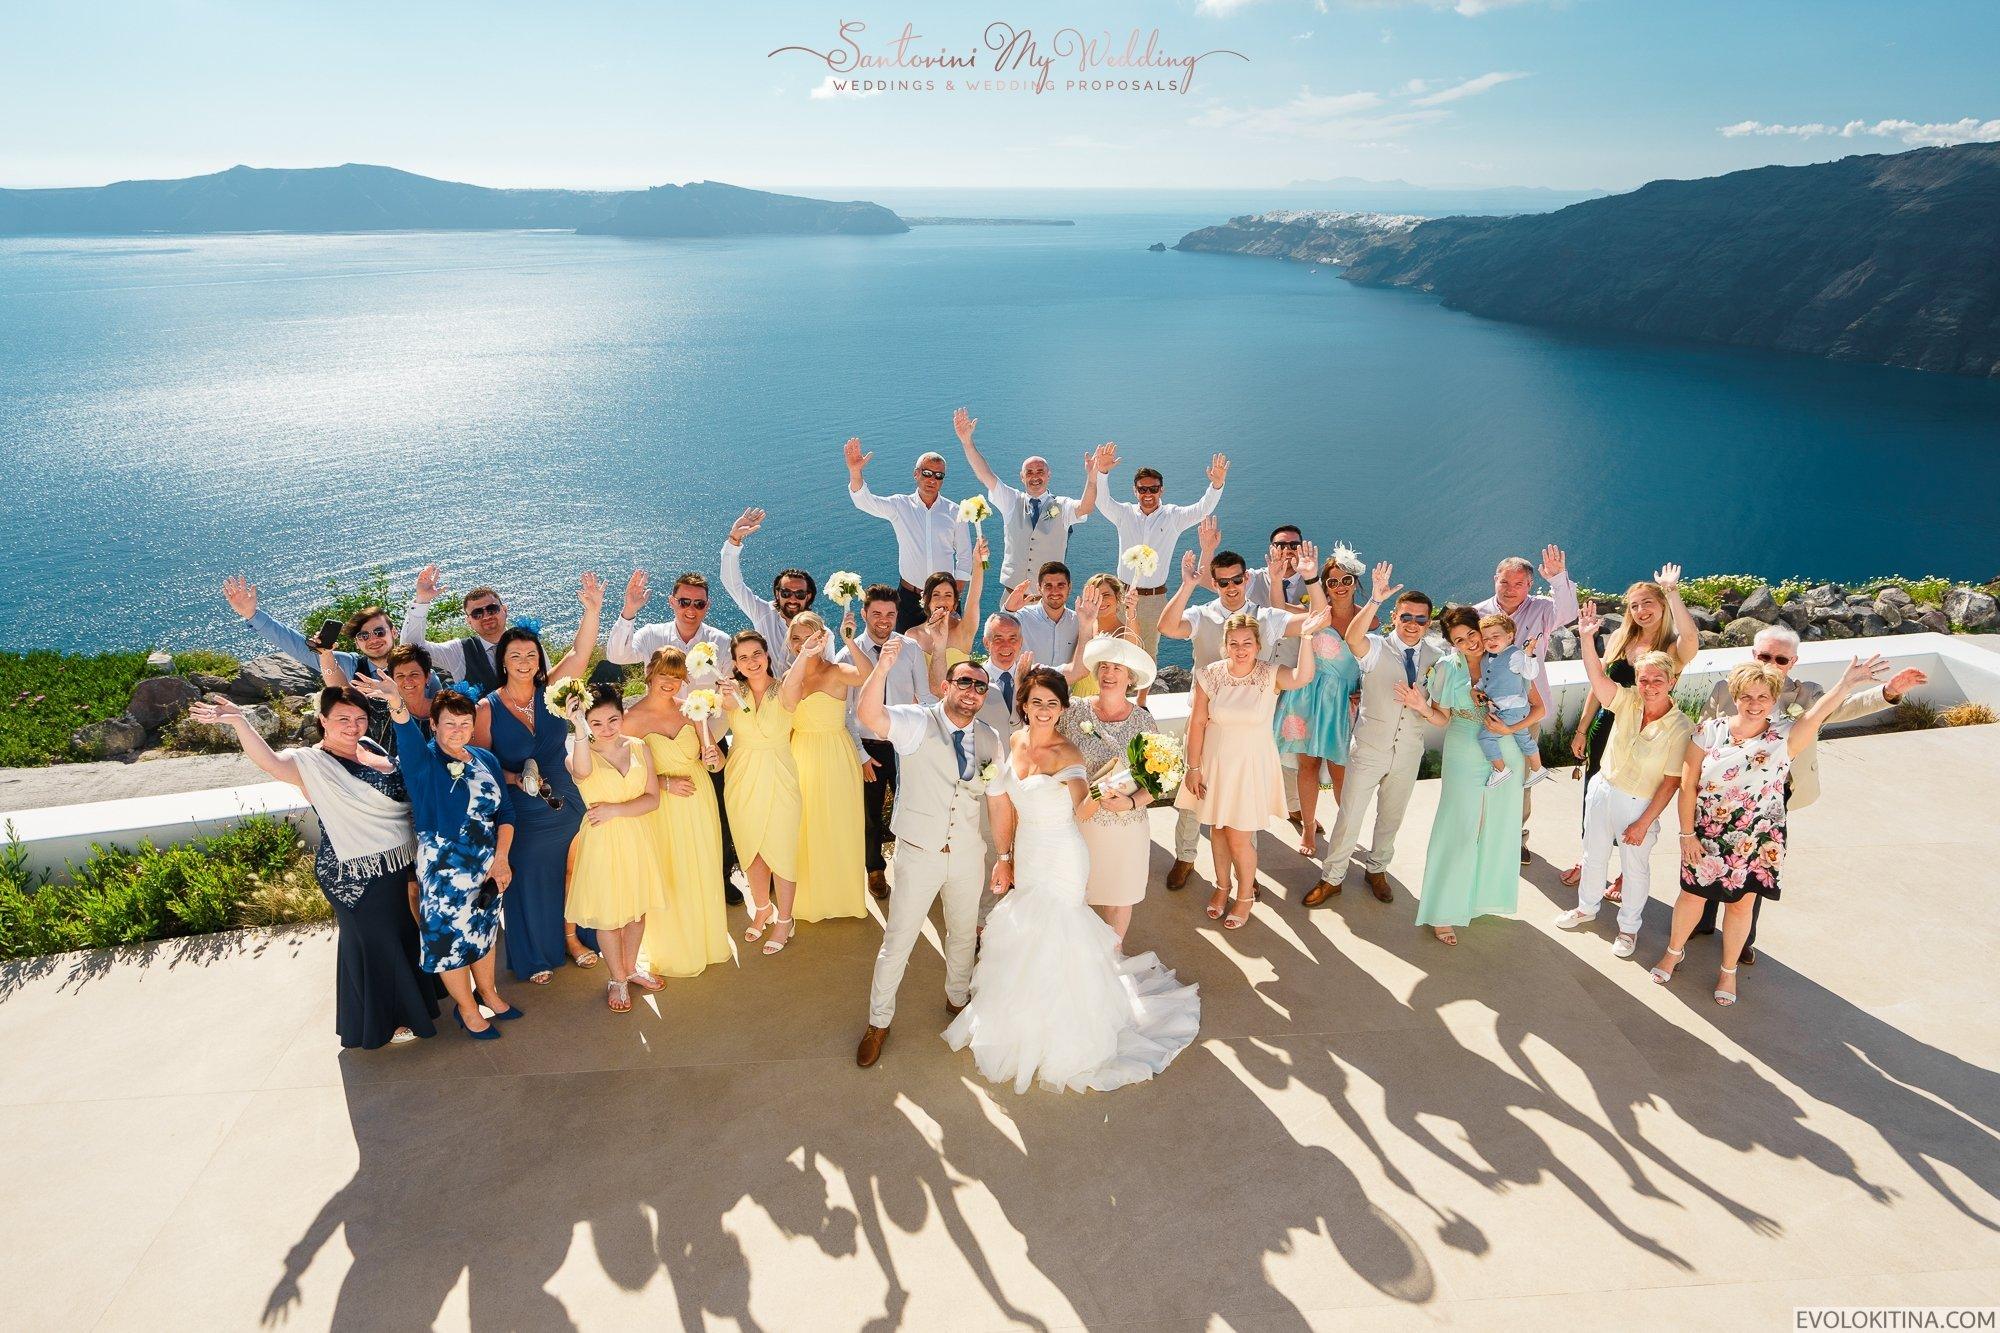 santorini weddings | santorini wedding packages with guests